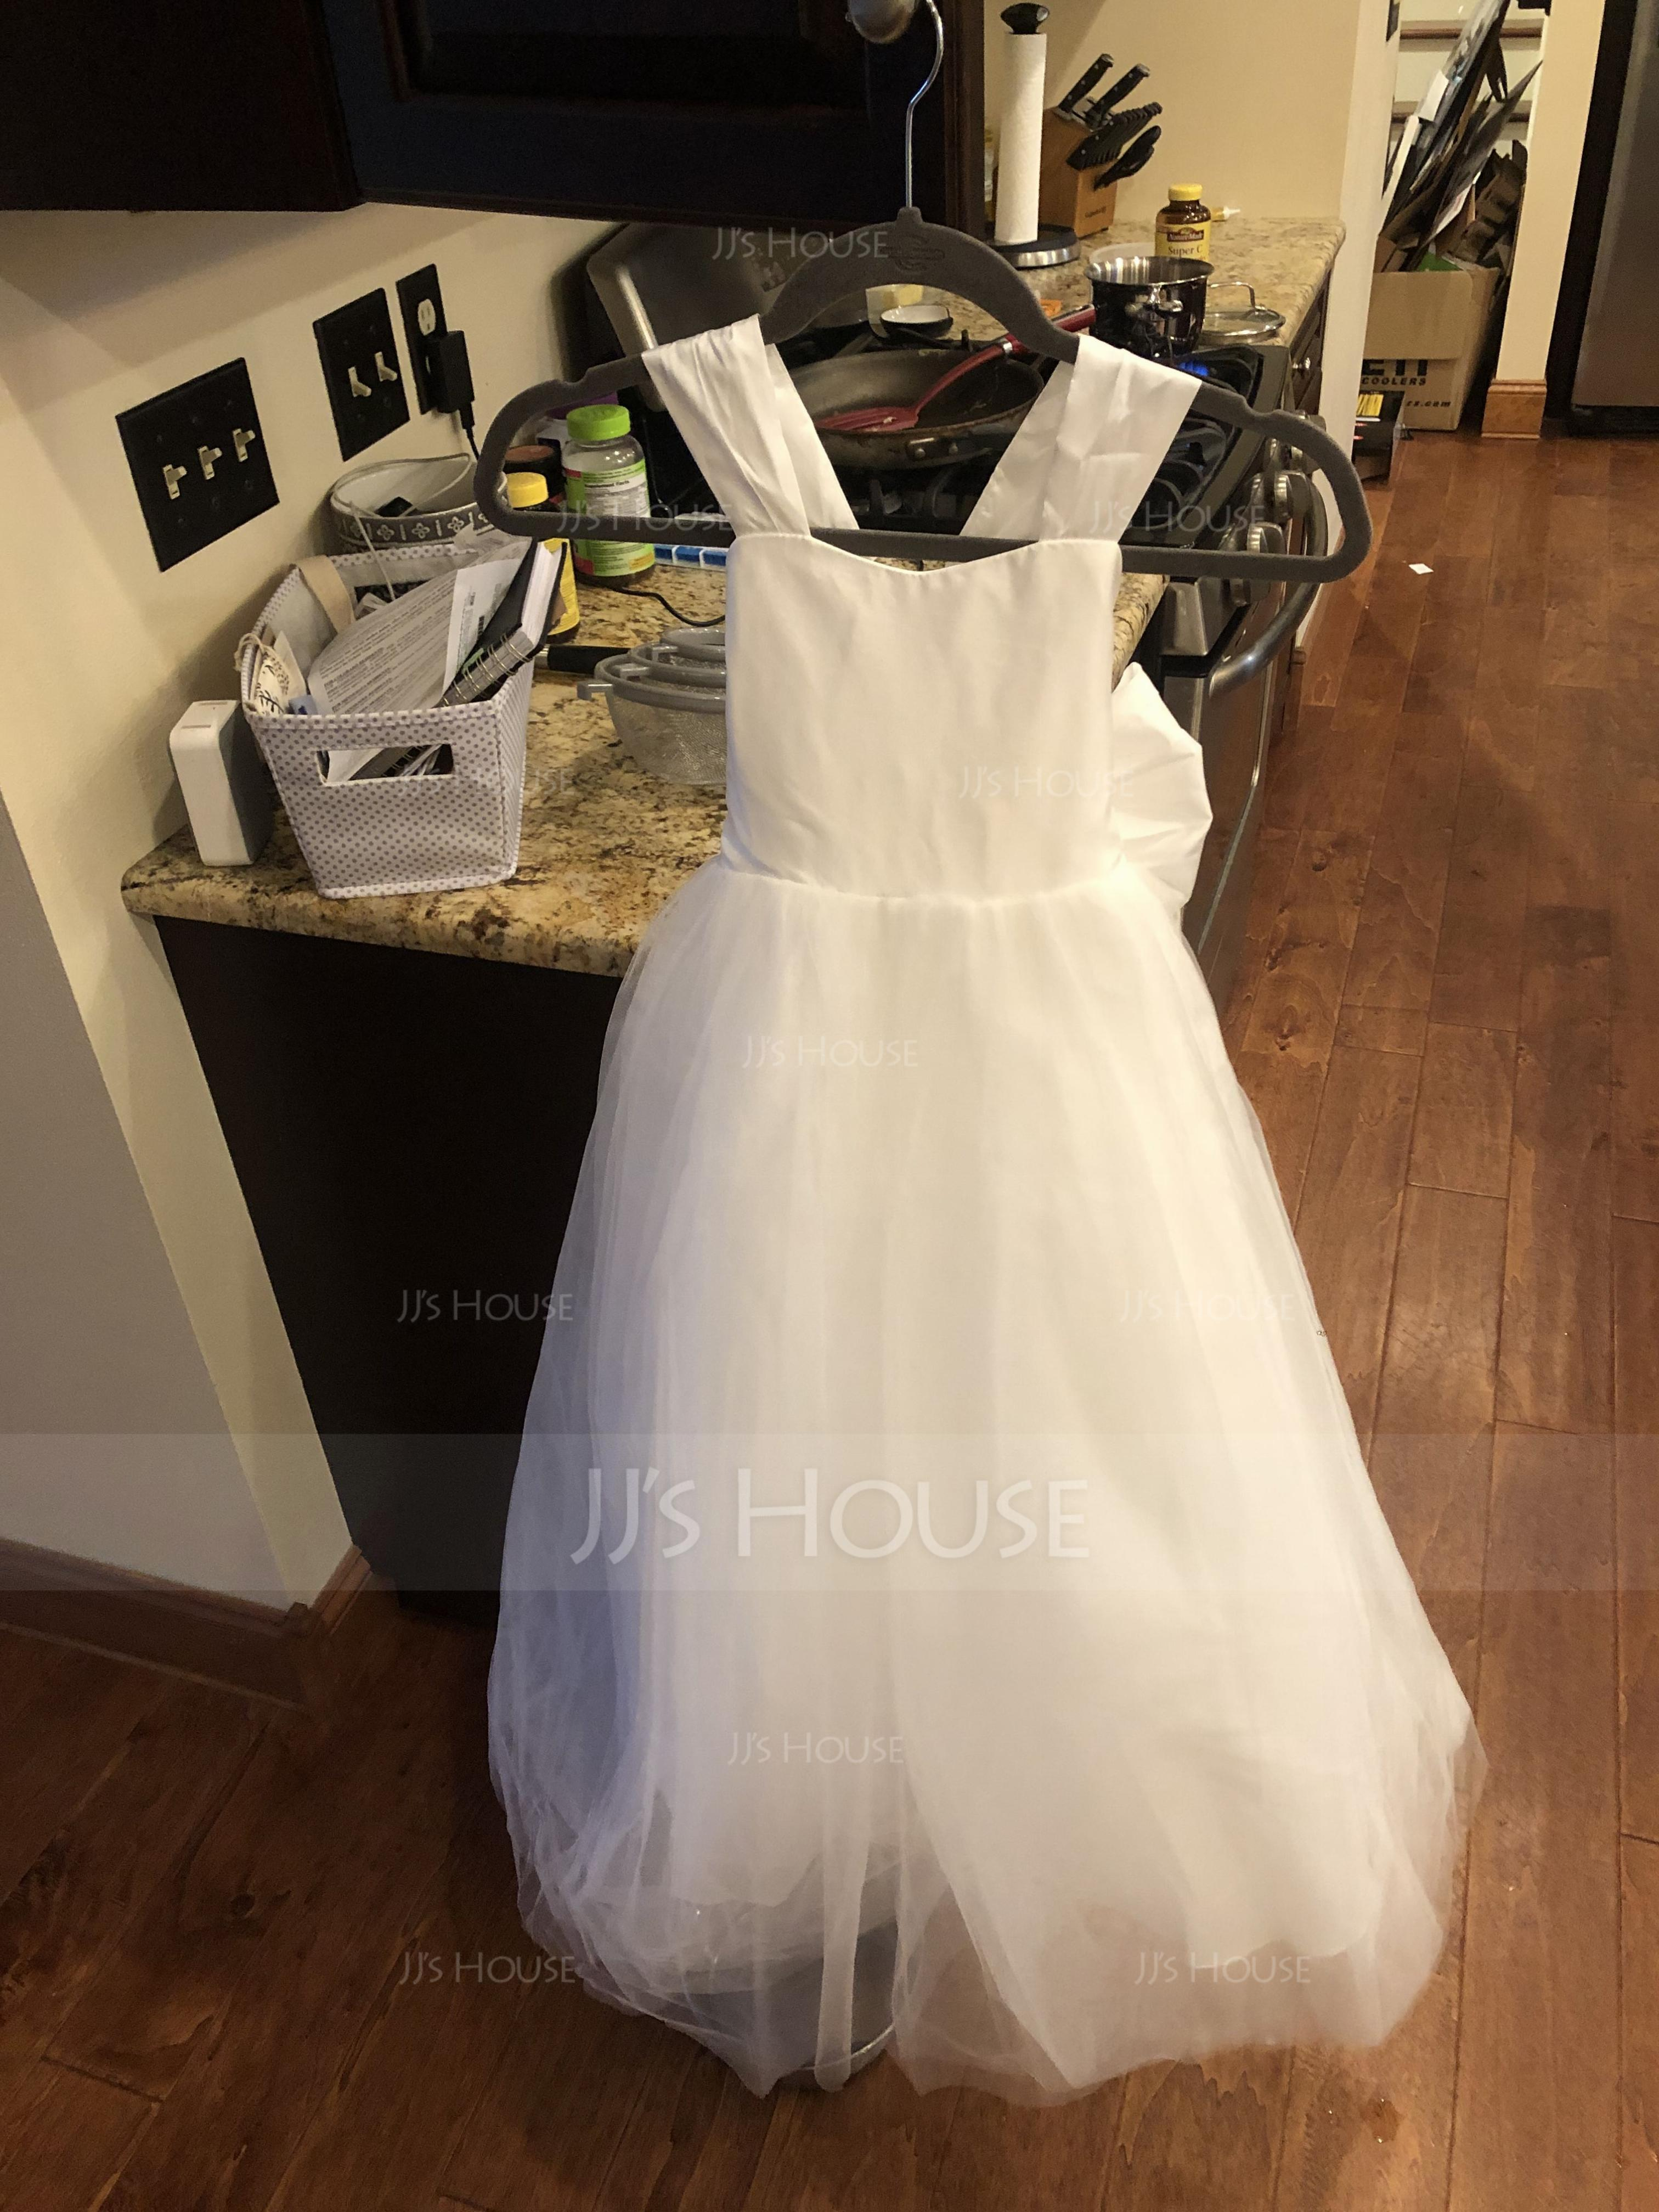 Ball Gown Floor-length Flower Girl Dress - Taffeta/Tulle Sleeveless Sweetheart With Bow(s) (010136601)